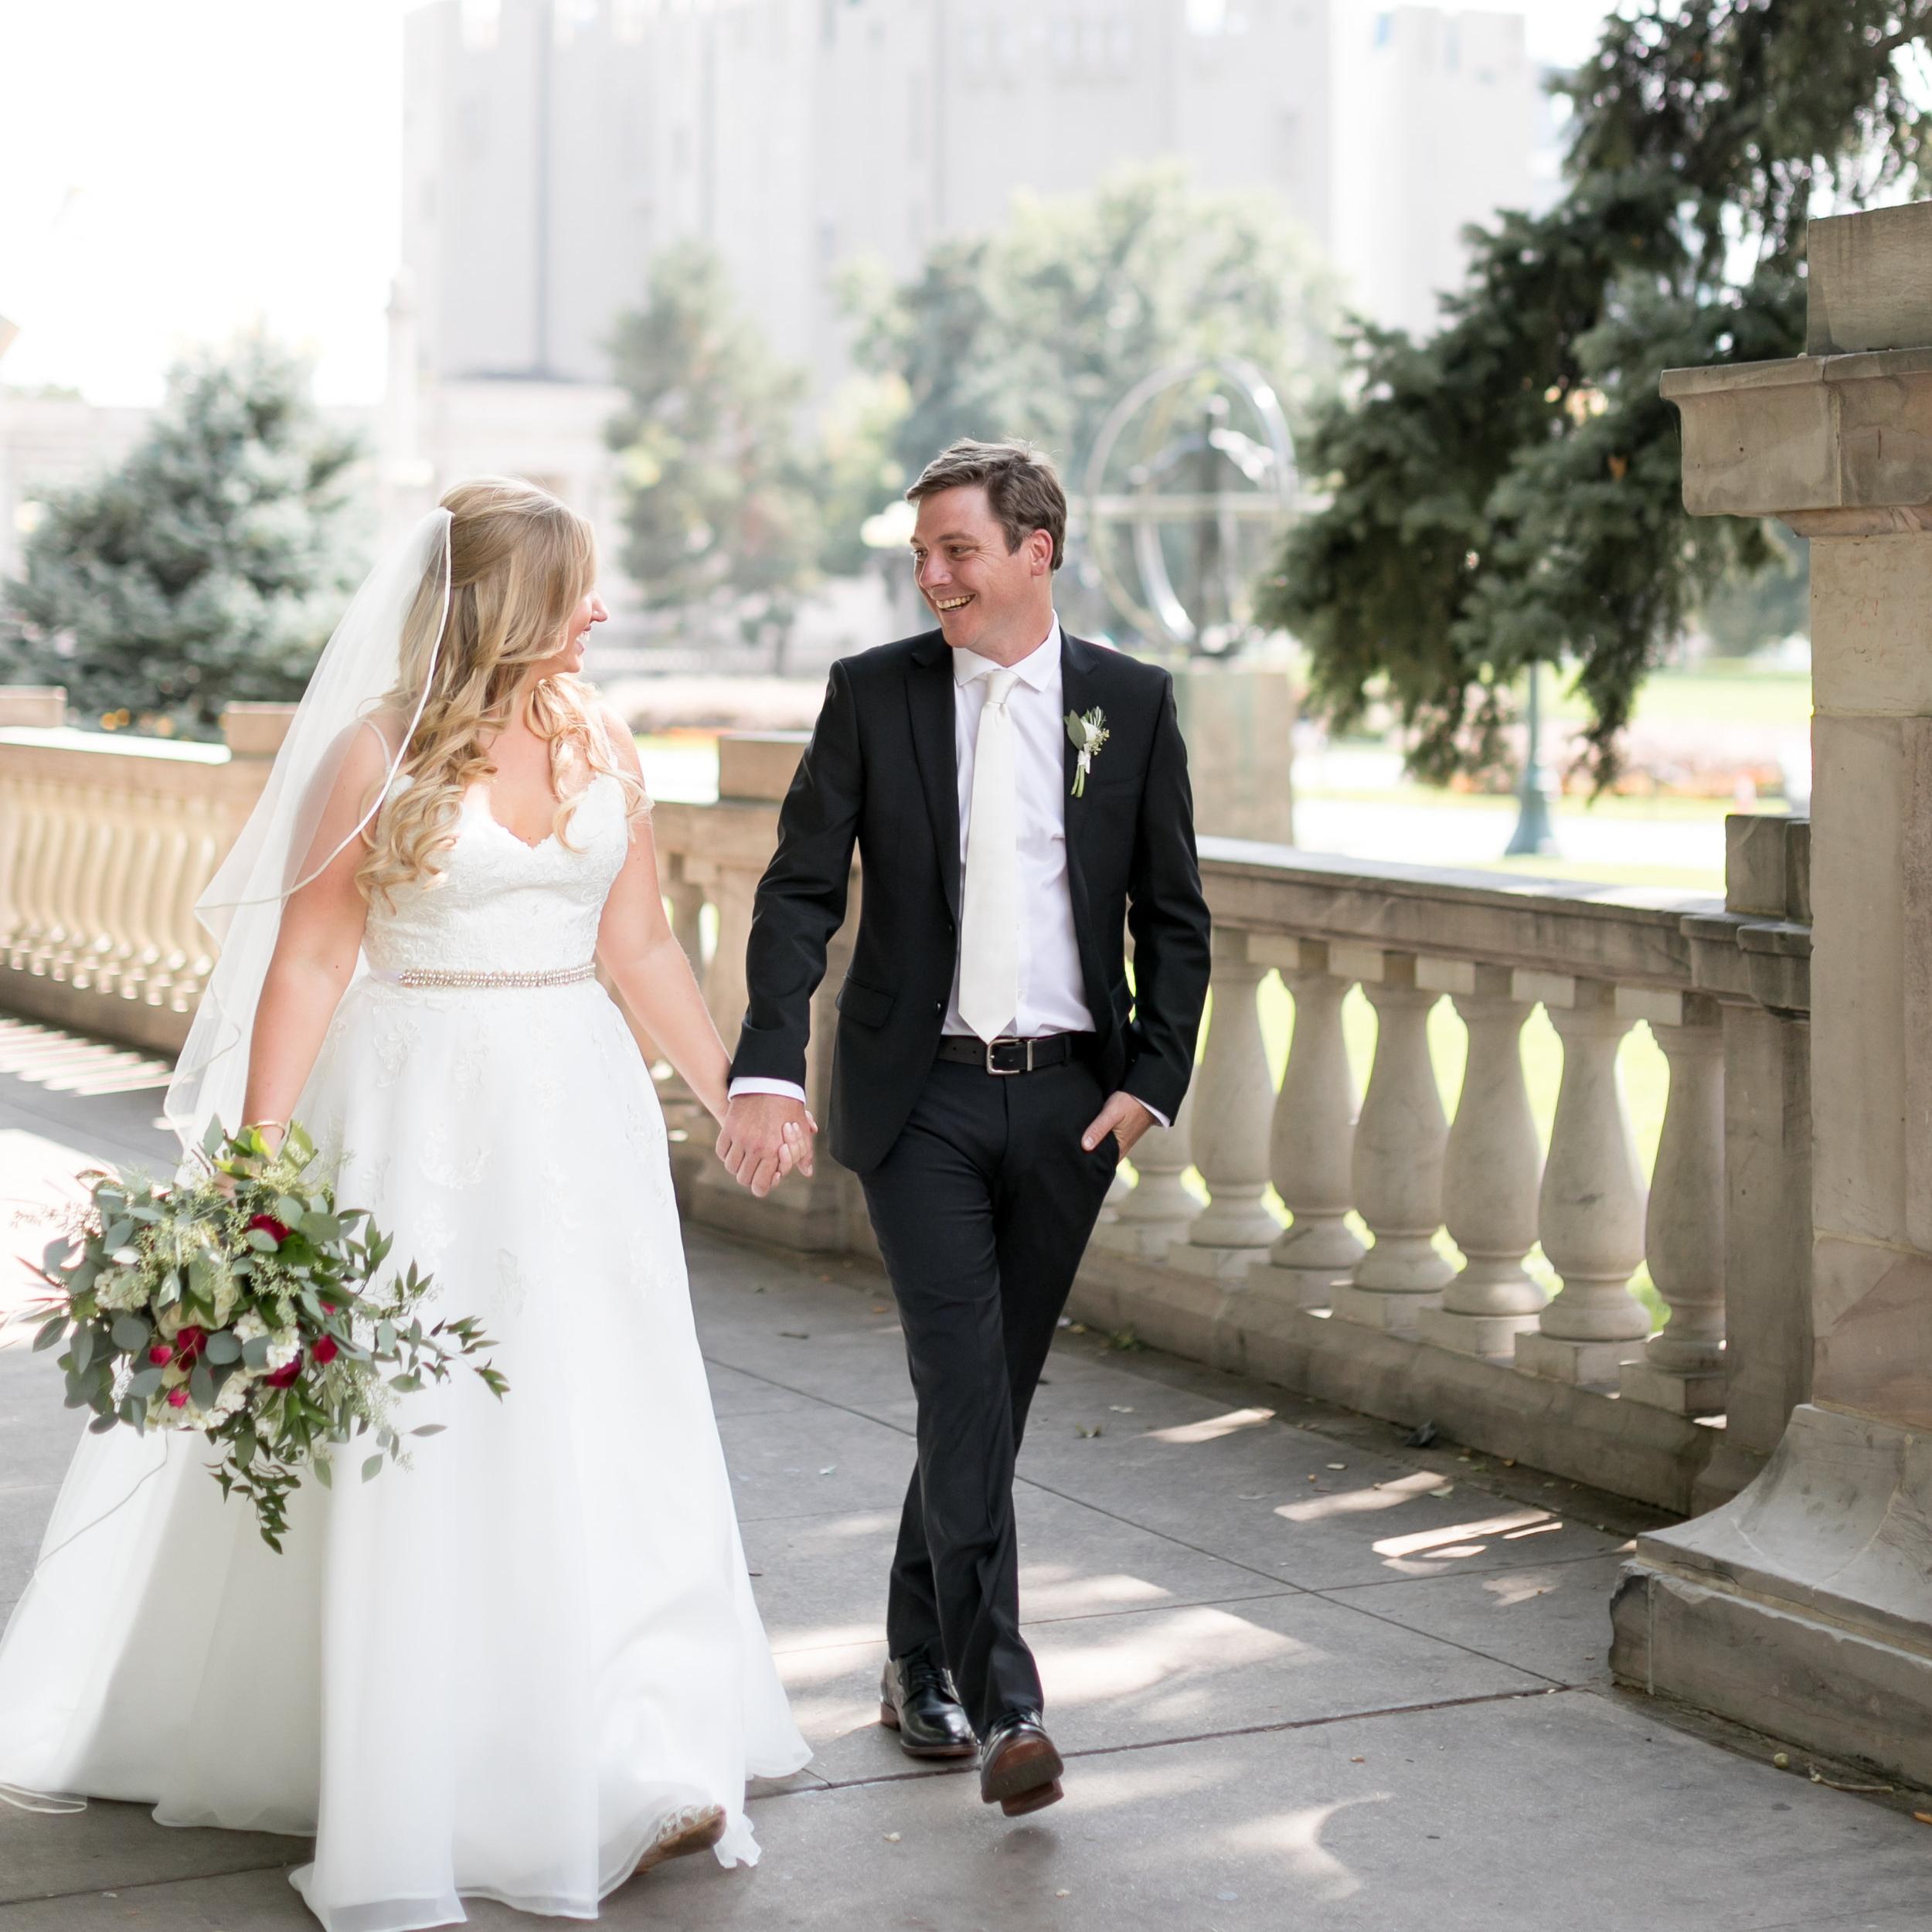 city-chic-downtown-denver-park-wedding27.jpg